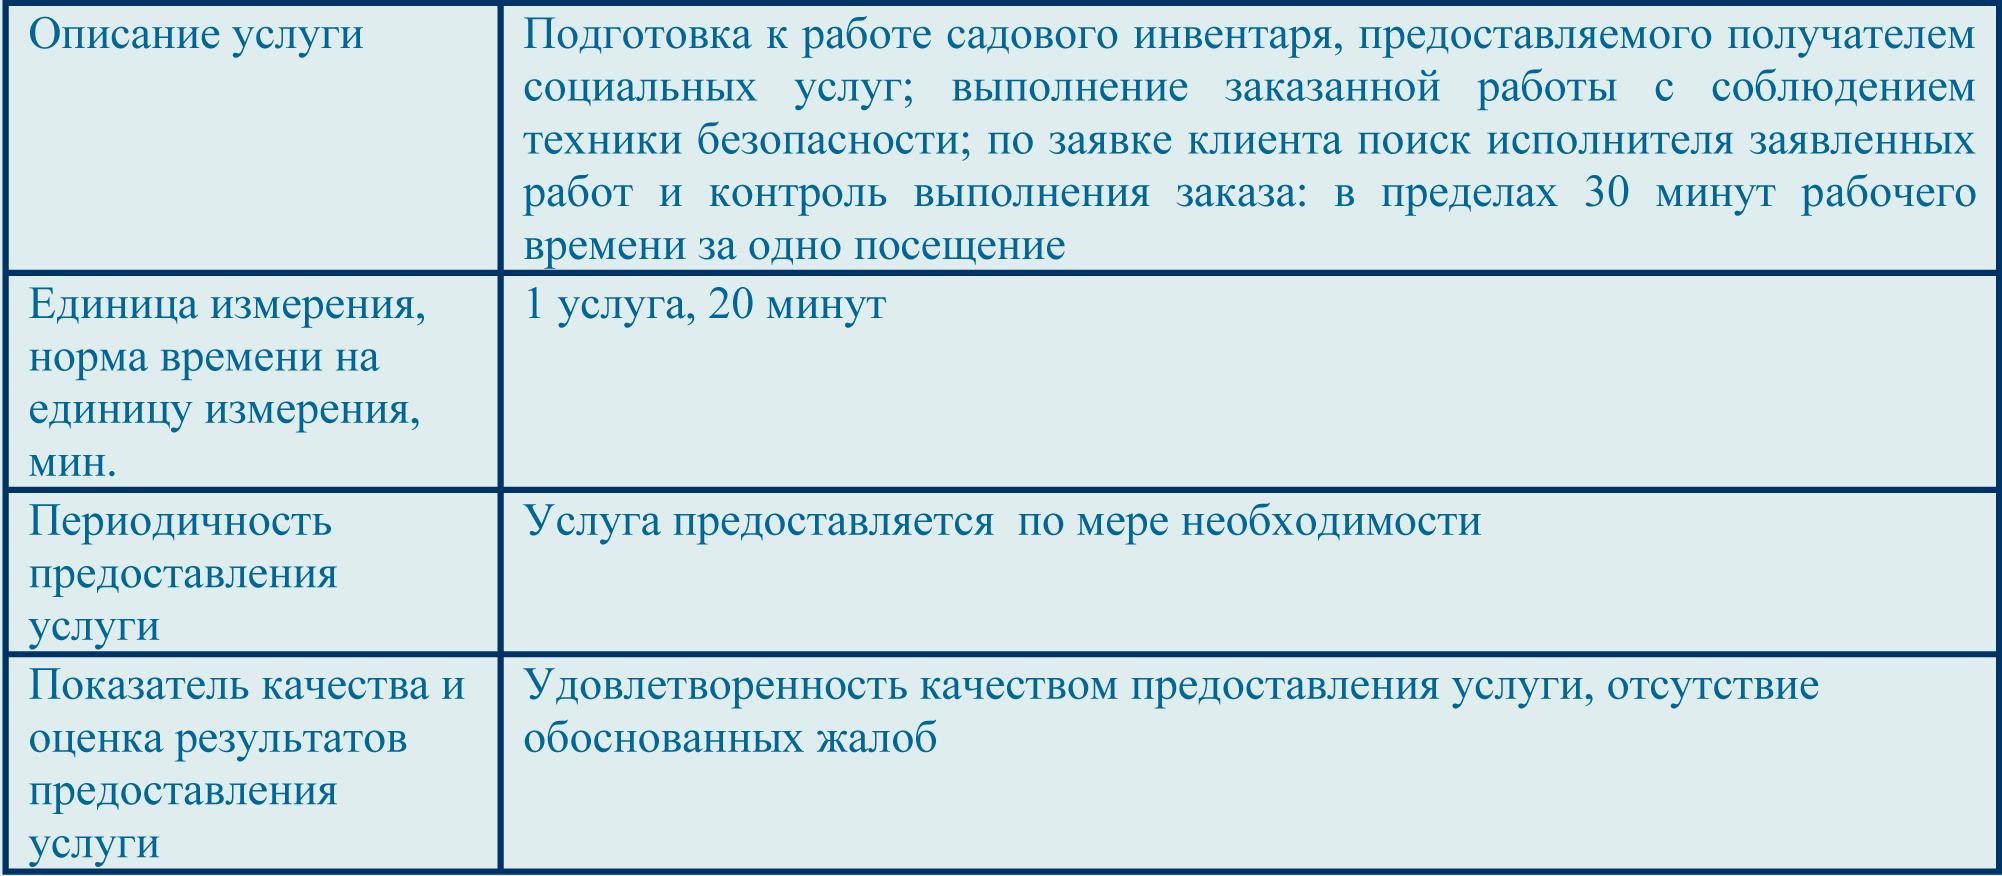 opisanie-uslug-csonekl3